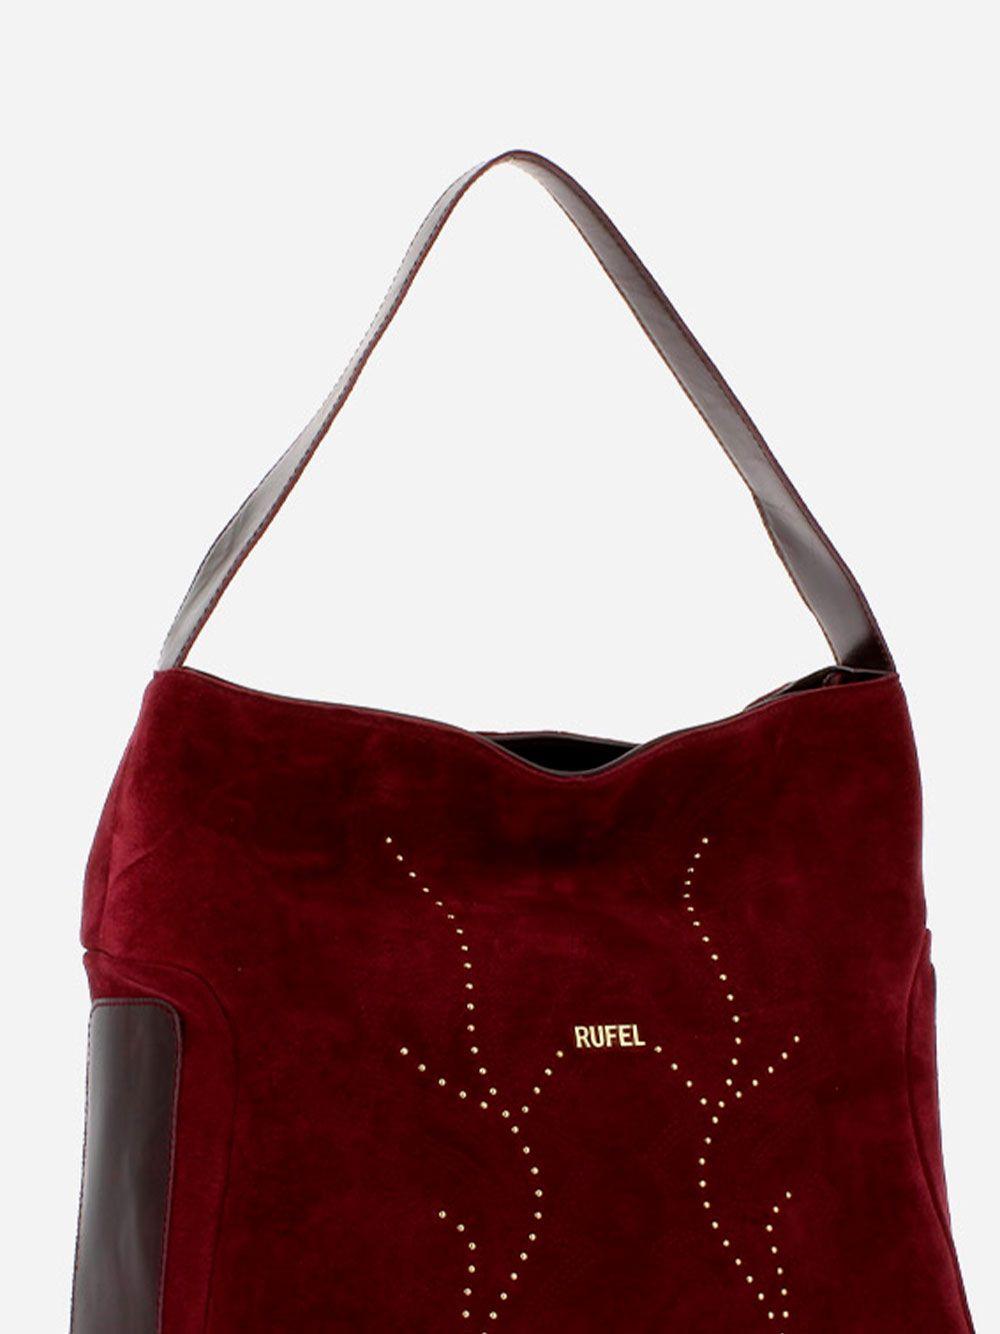 Suede Burgundy Shoulder Bag   Rufel